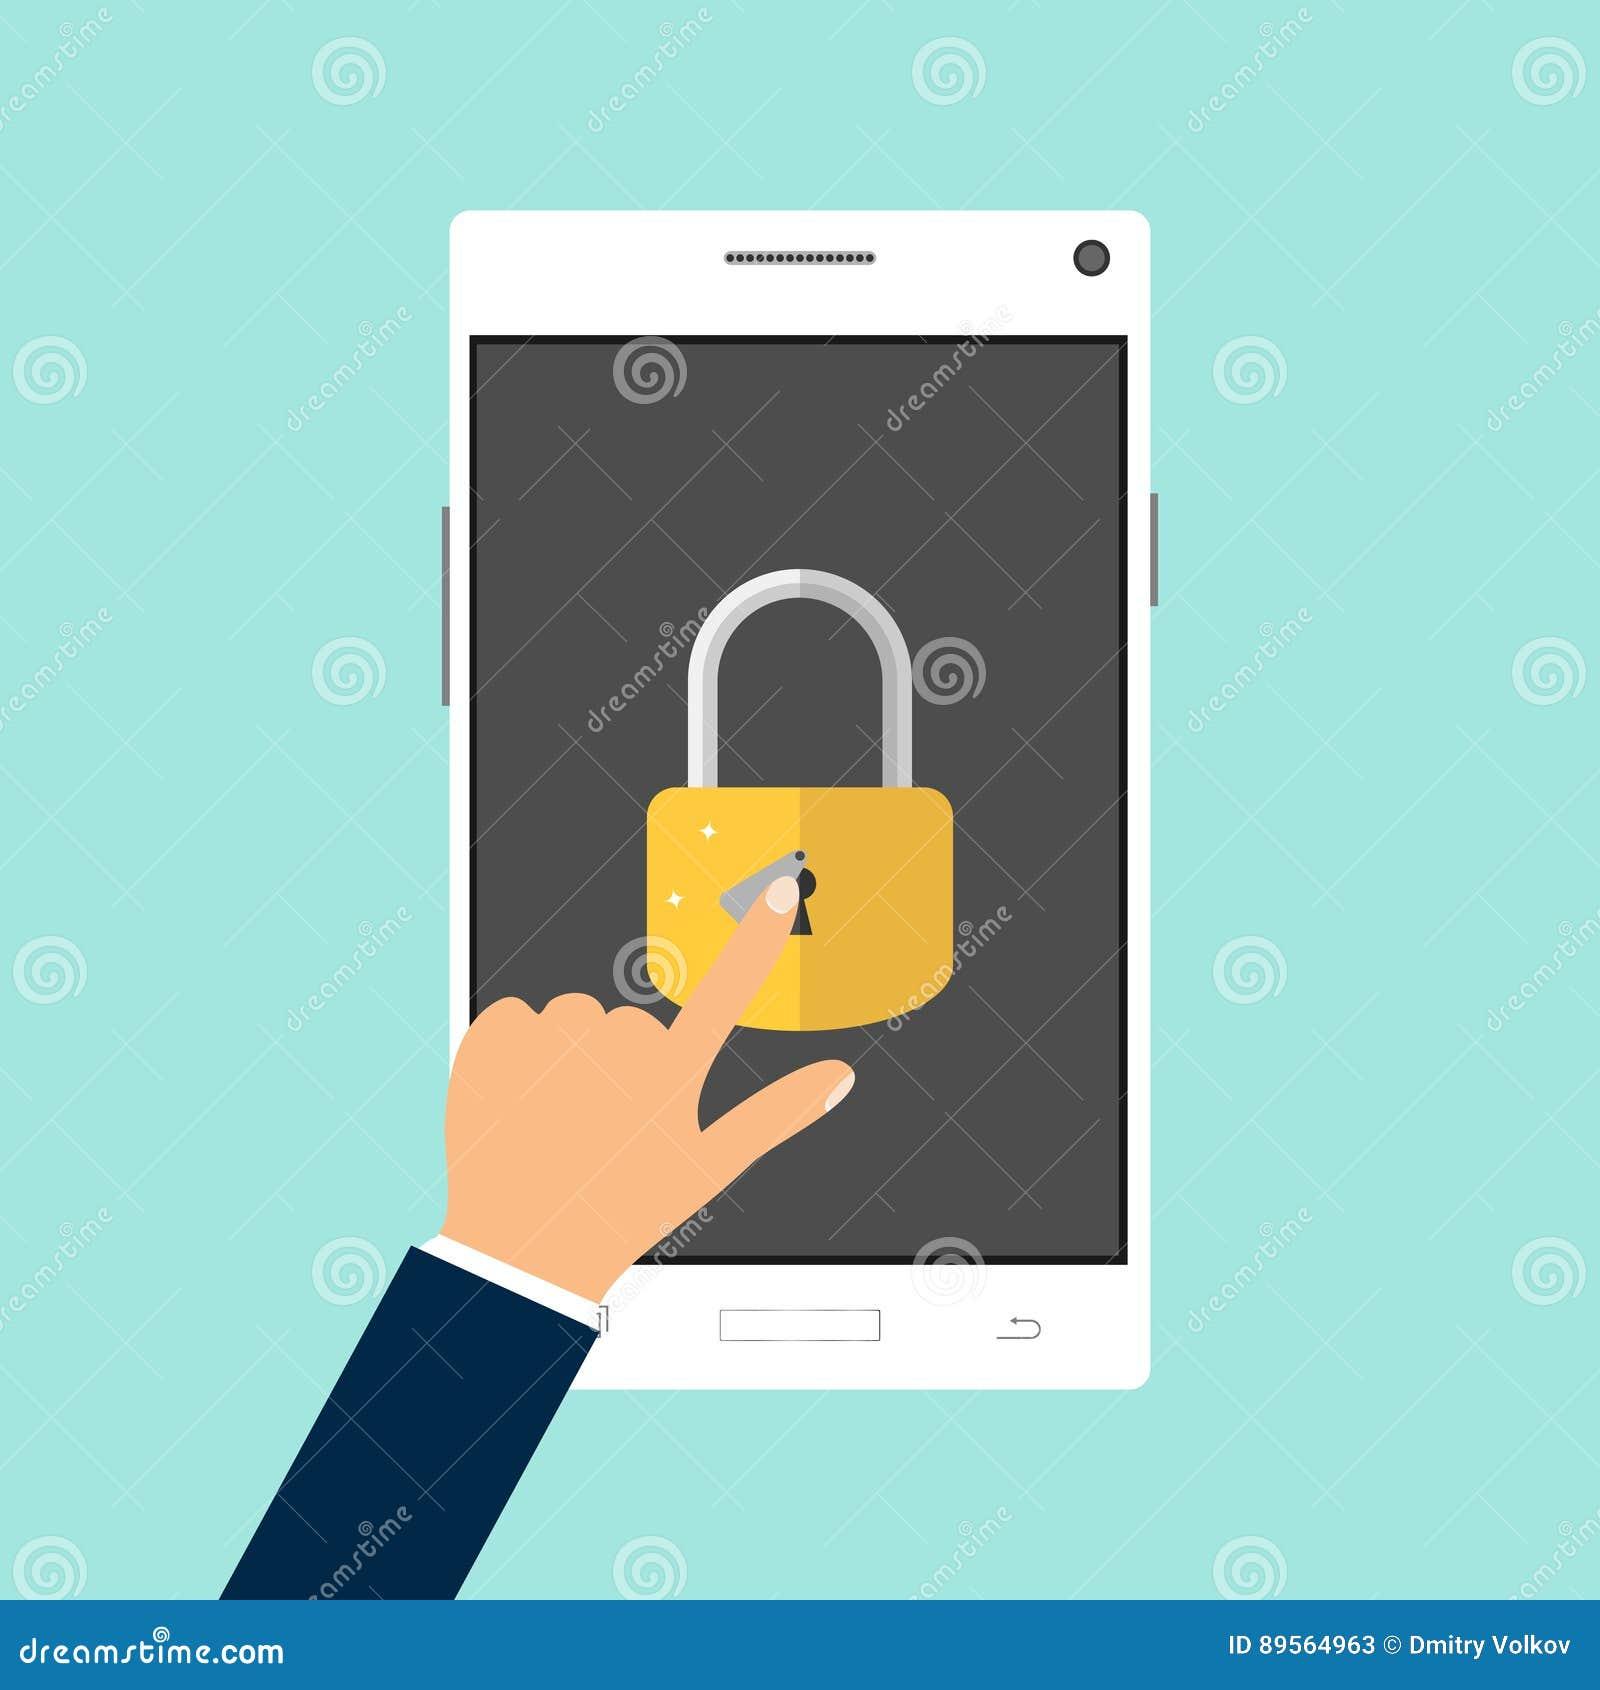 The hand unlocks the mobile phone